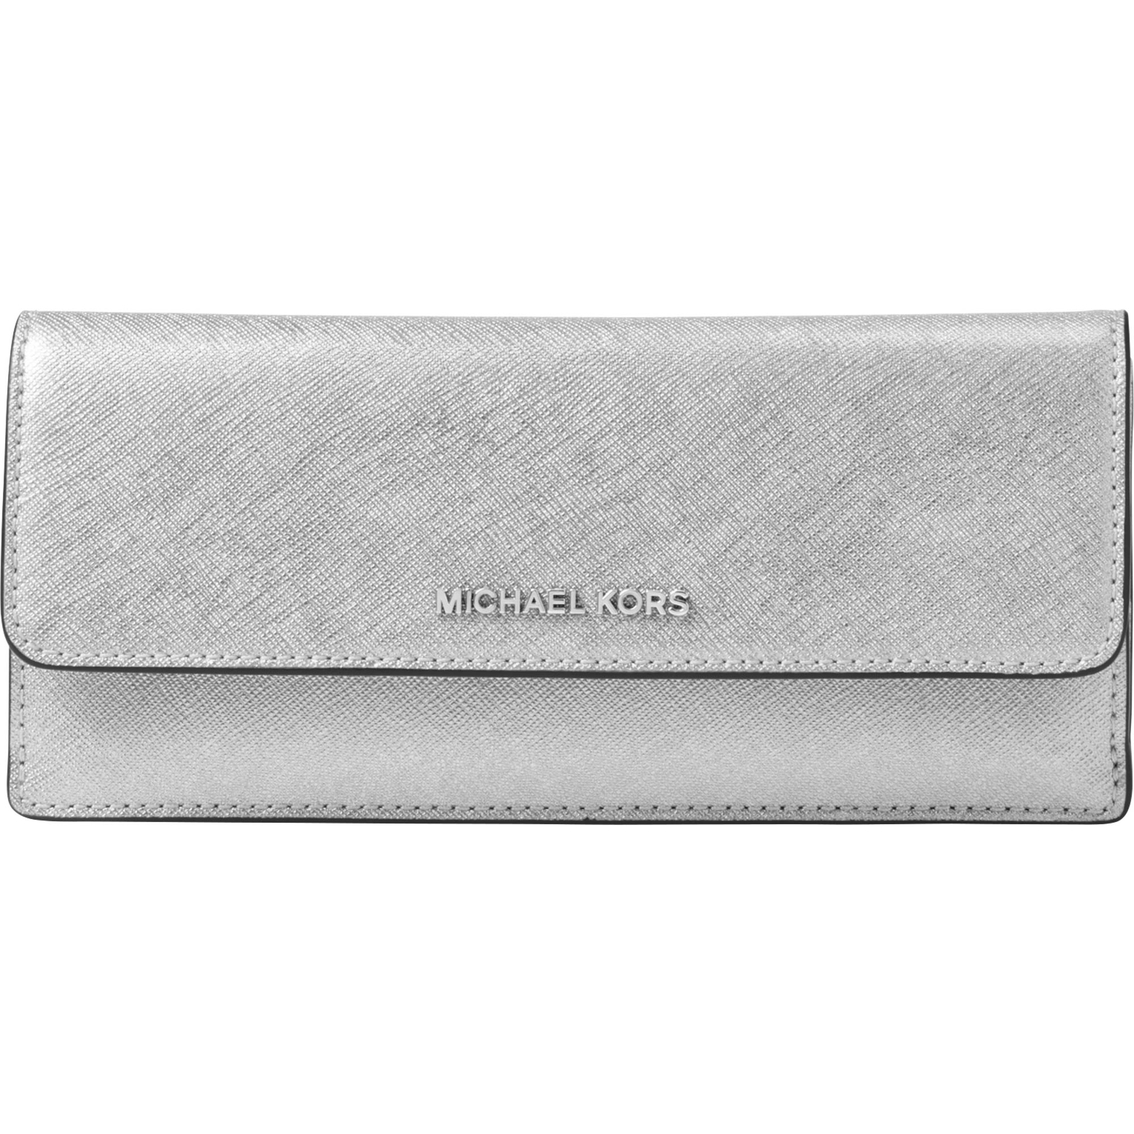 c5e730654d57 Michael Kors Money Pieces Flat Wallet In Metallic Saffiano Leather ...